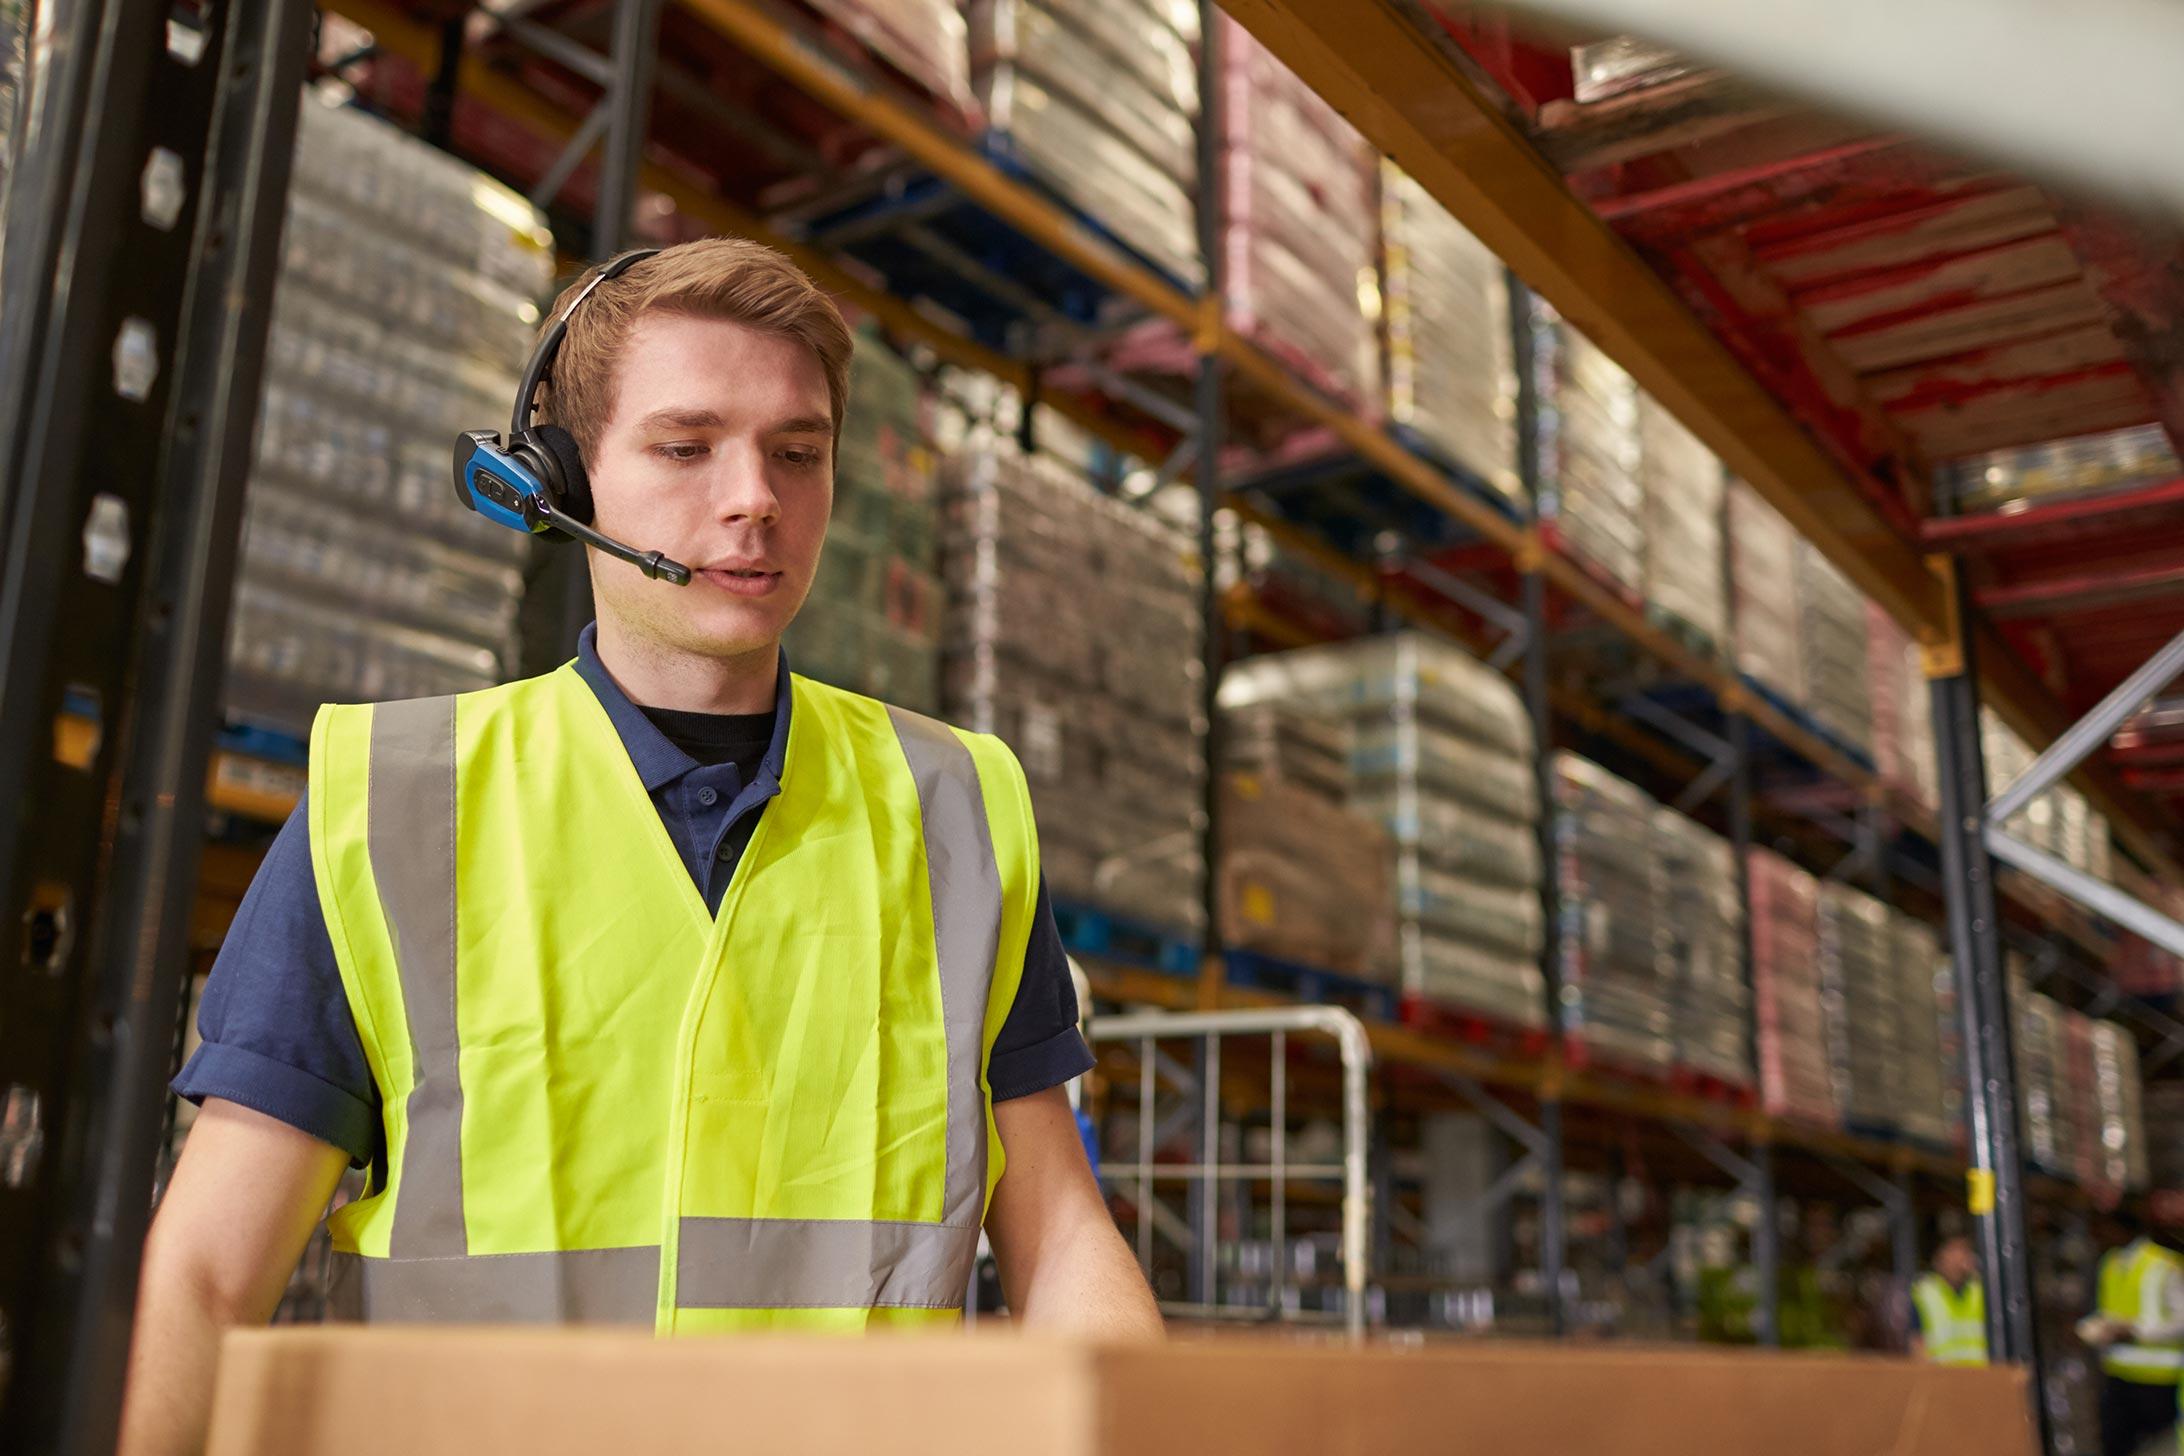 Warehouse Operations: Optimizing the Picking Process